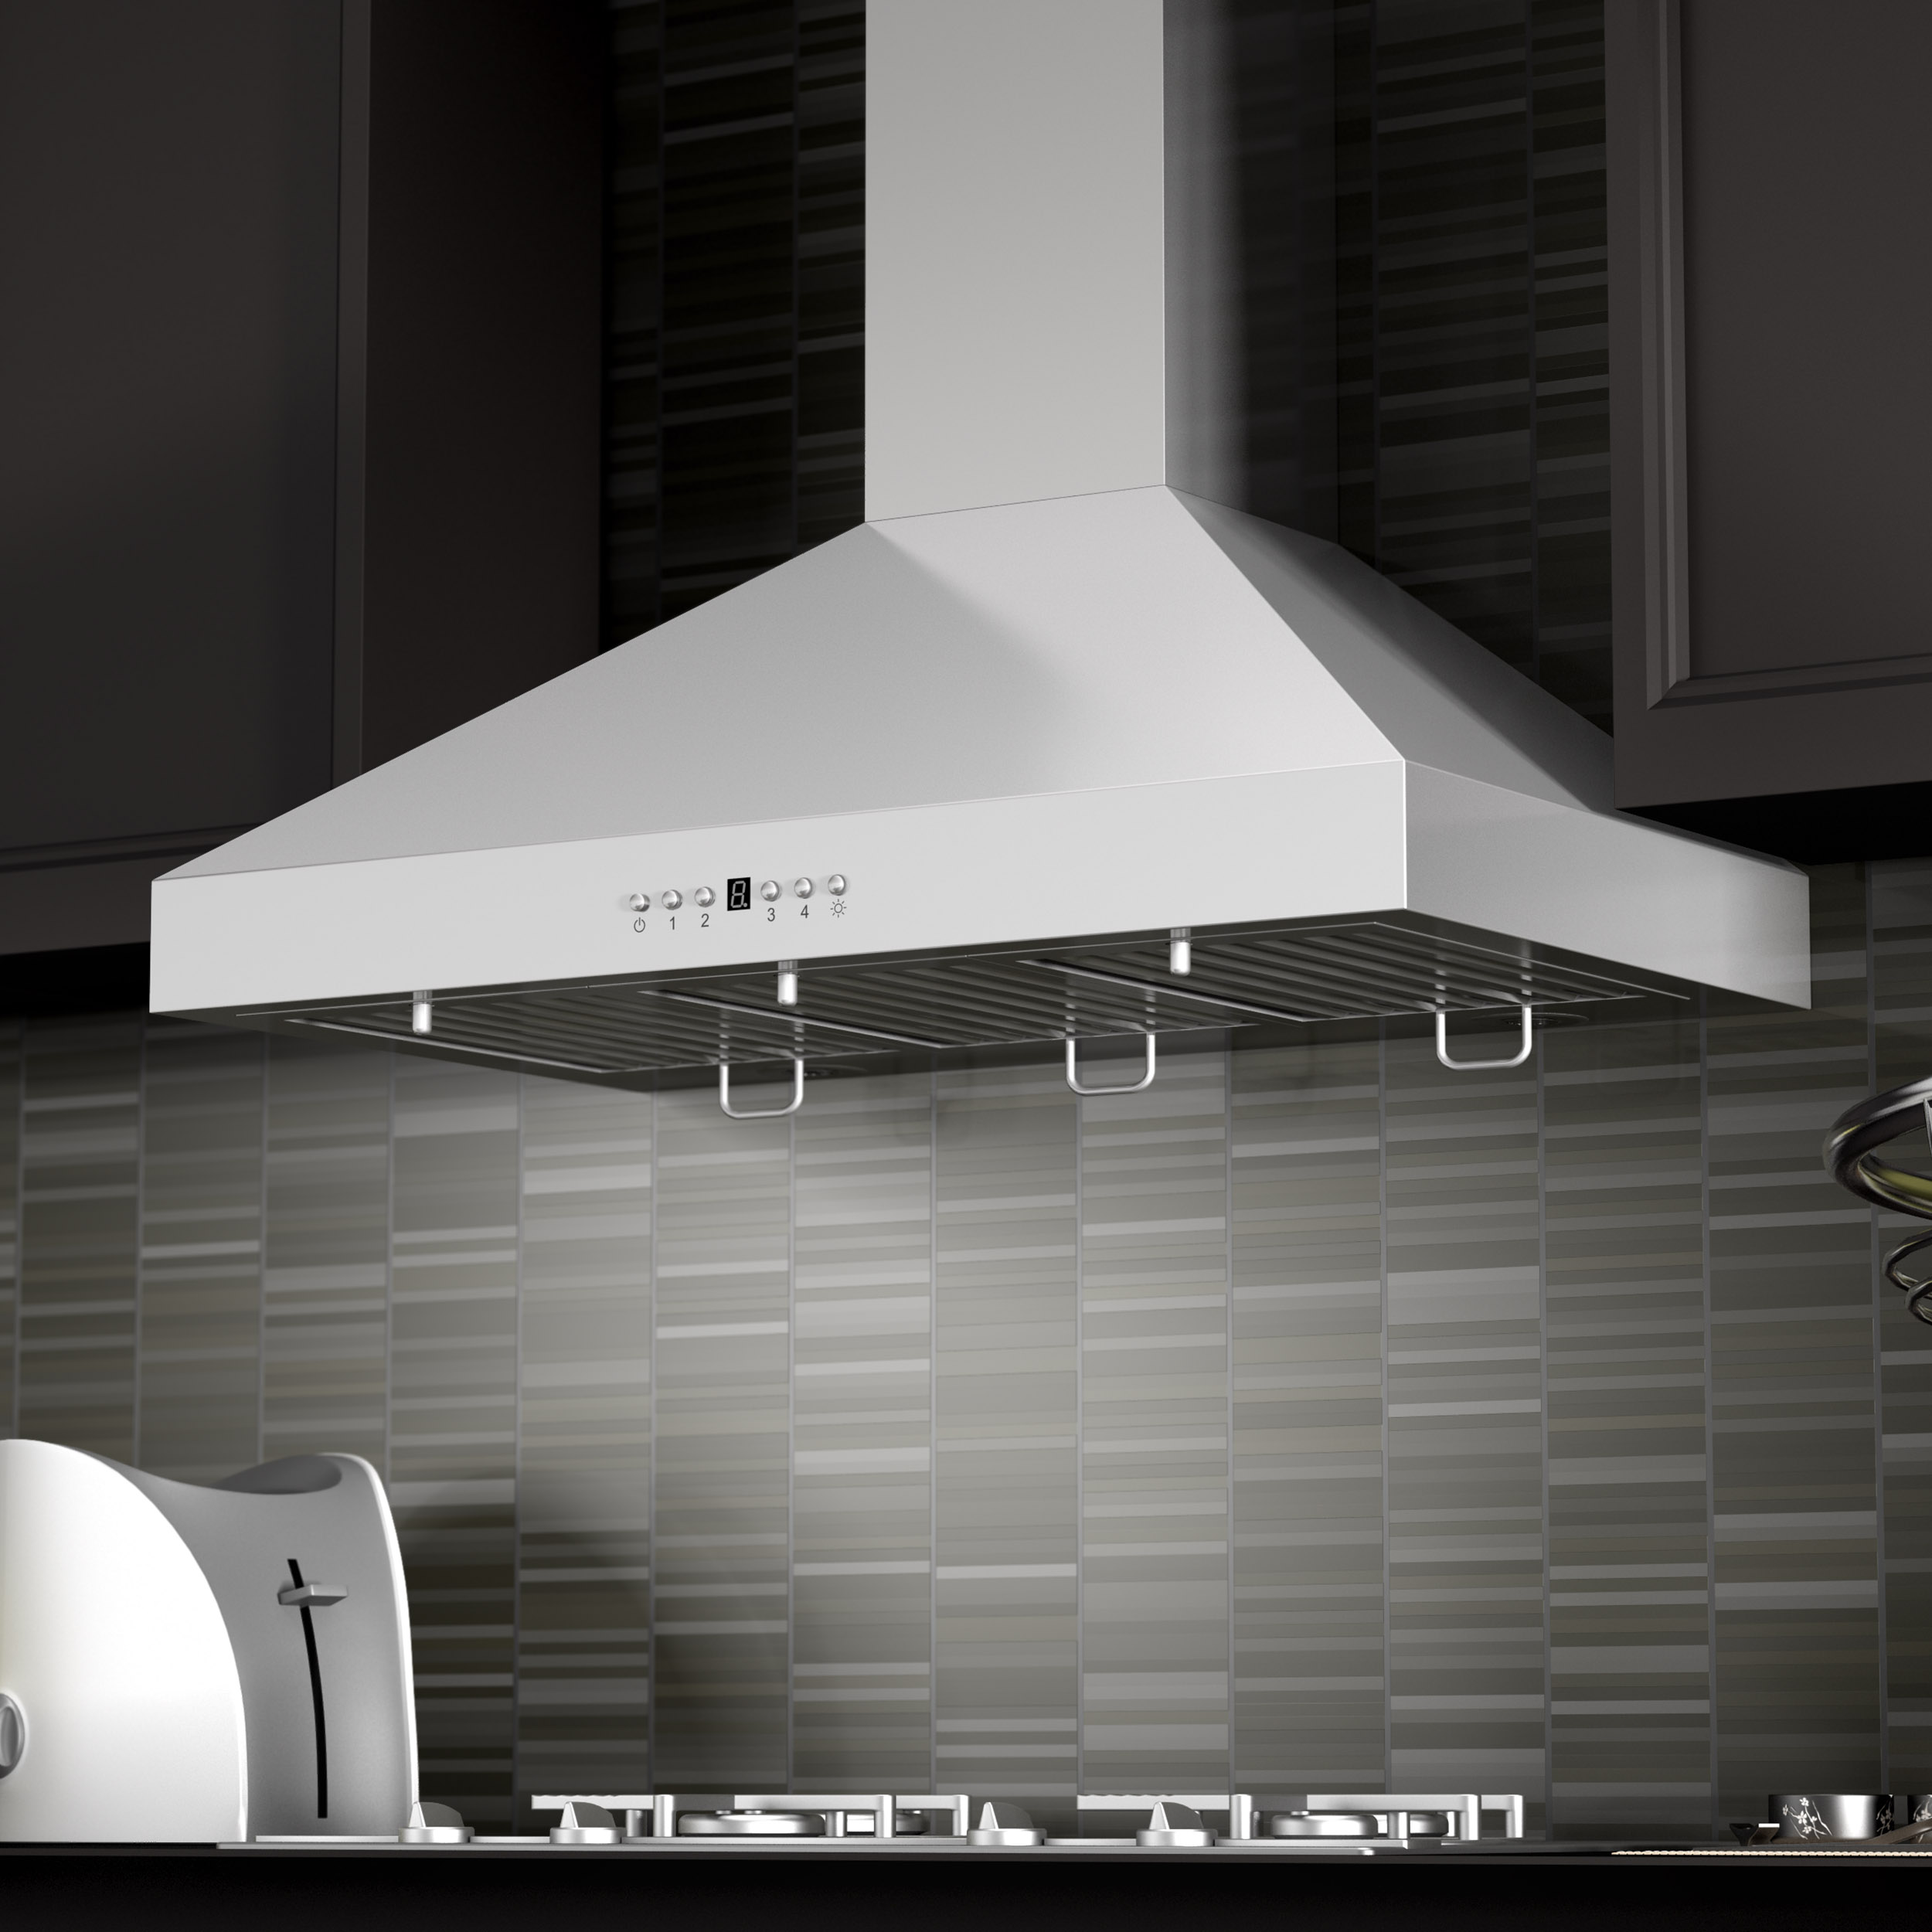 zline-stainless-steel-wall-mounted-range-hood-KL3-detail 1.jpg